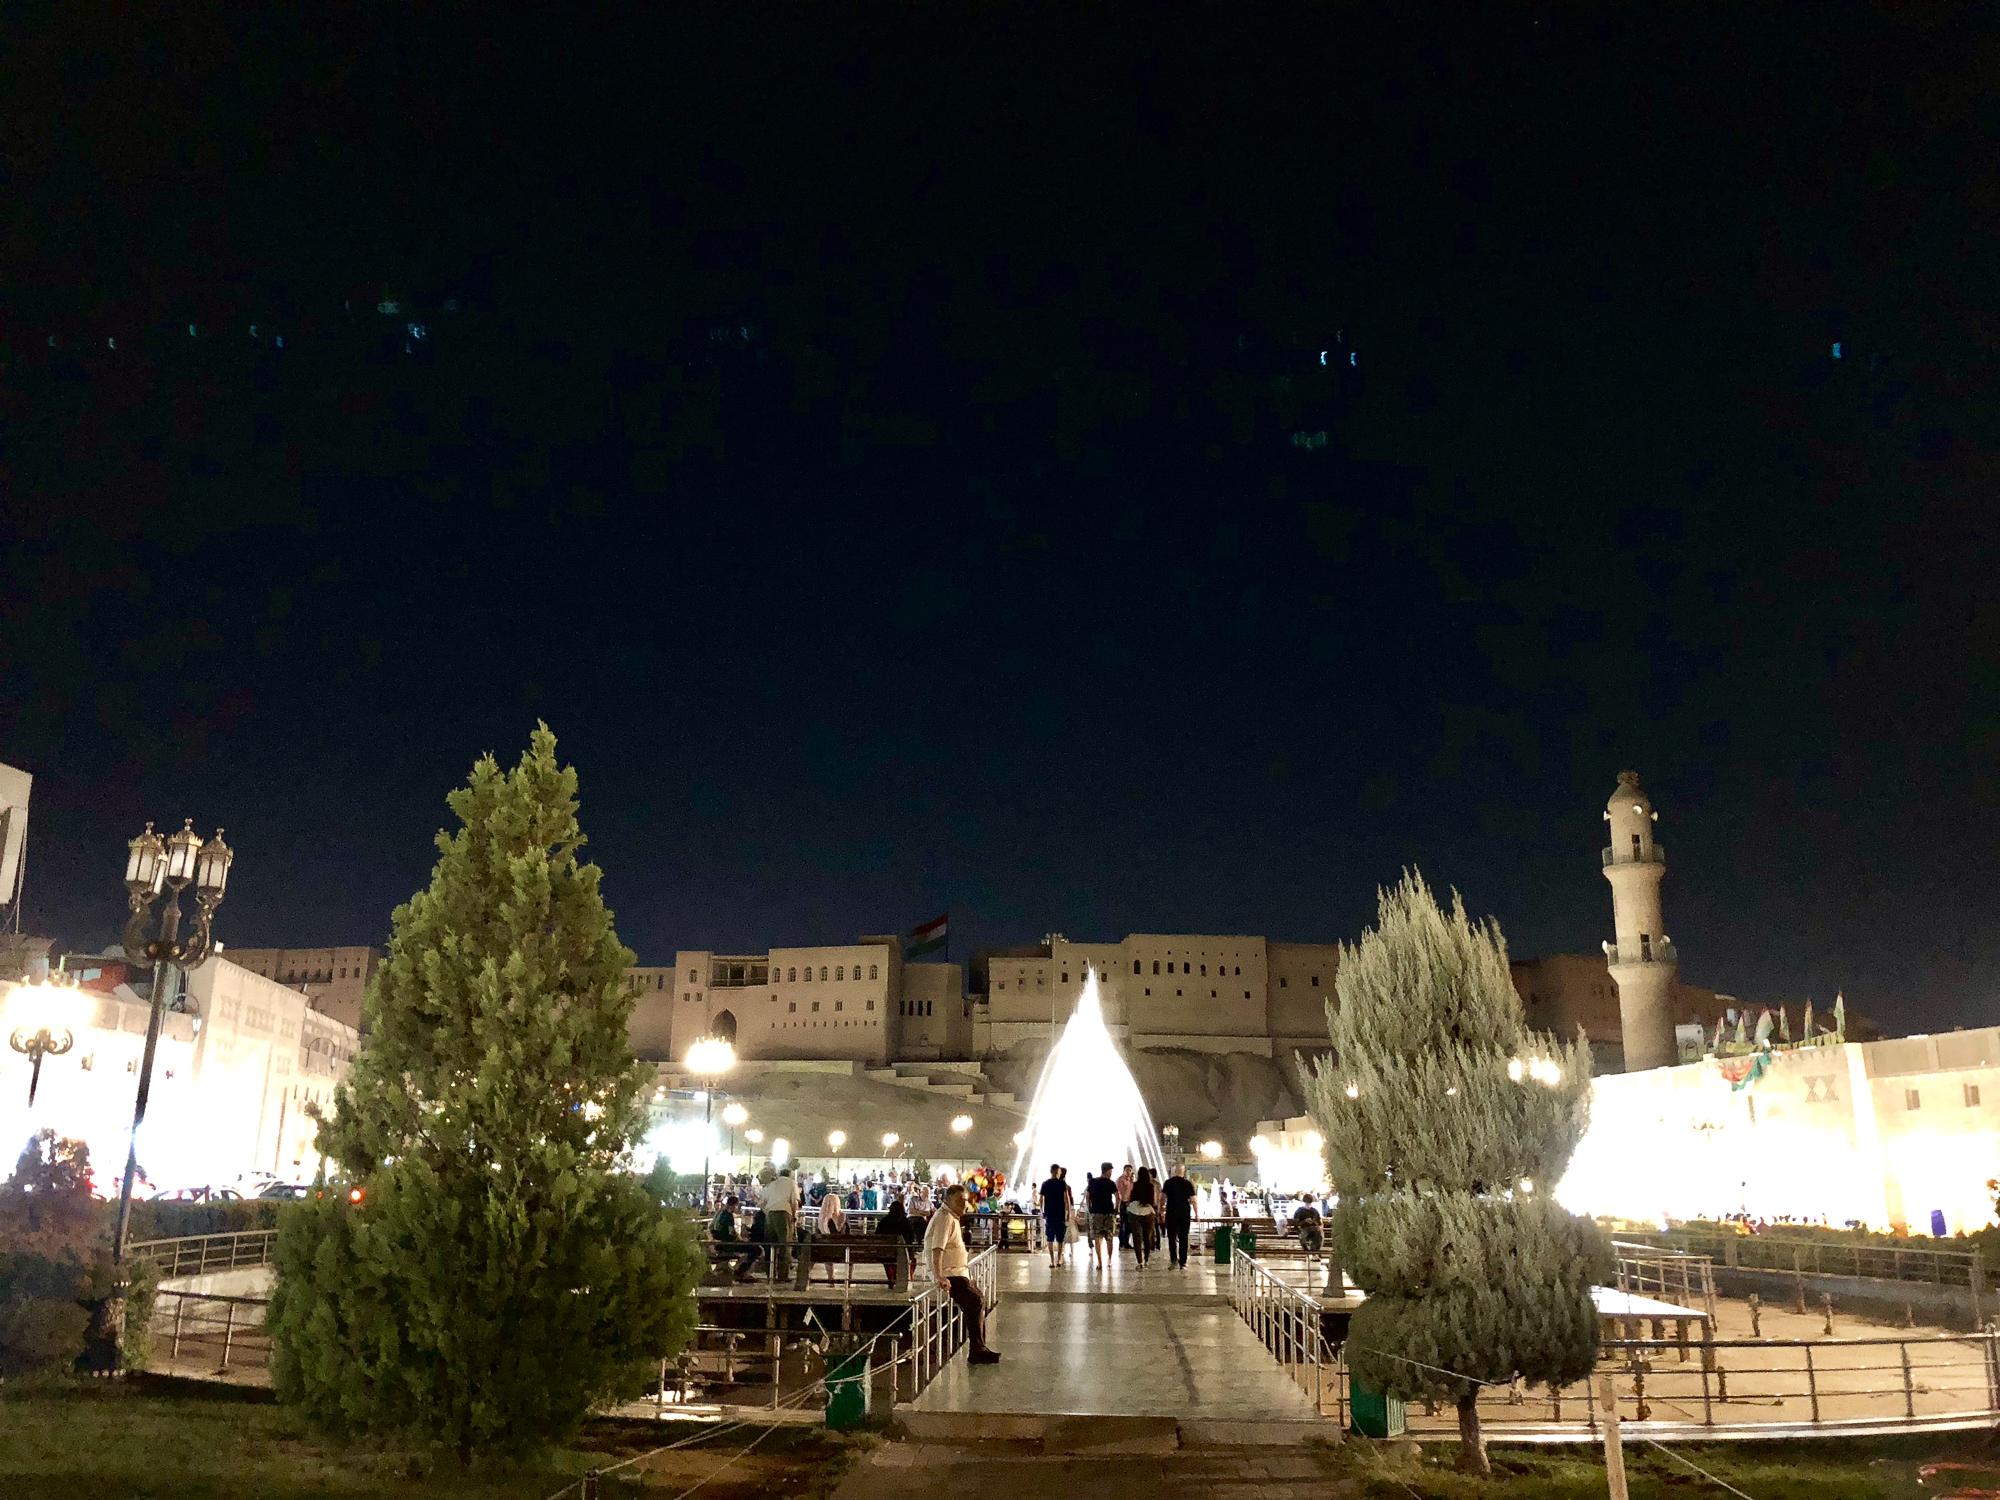 Central square in Erbil